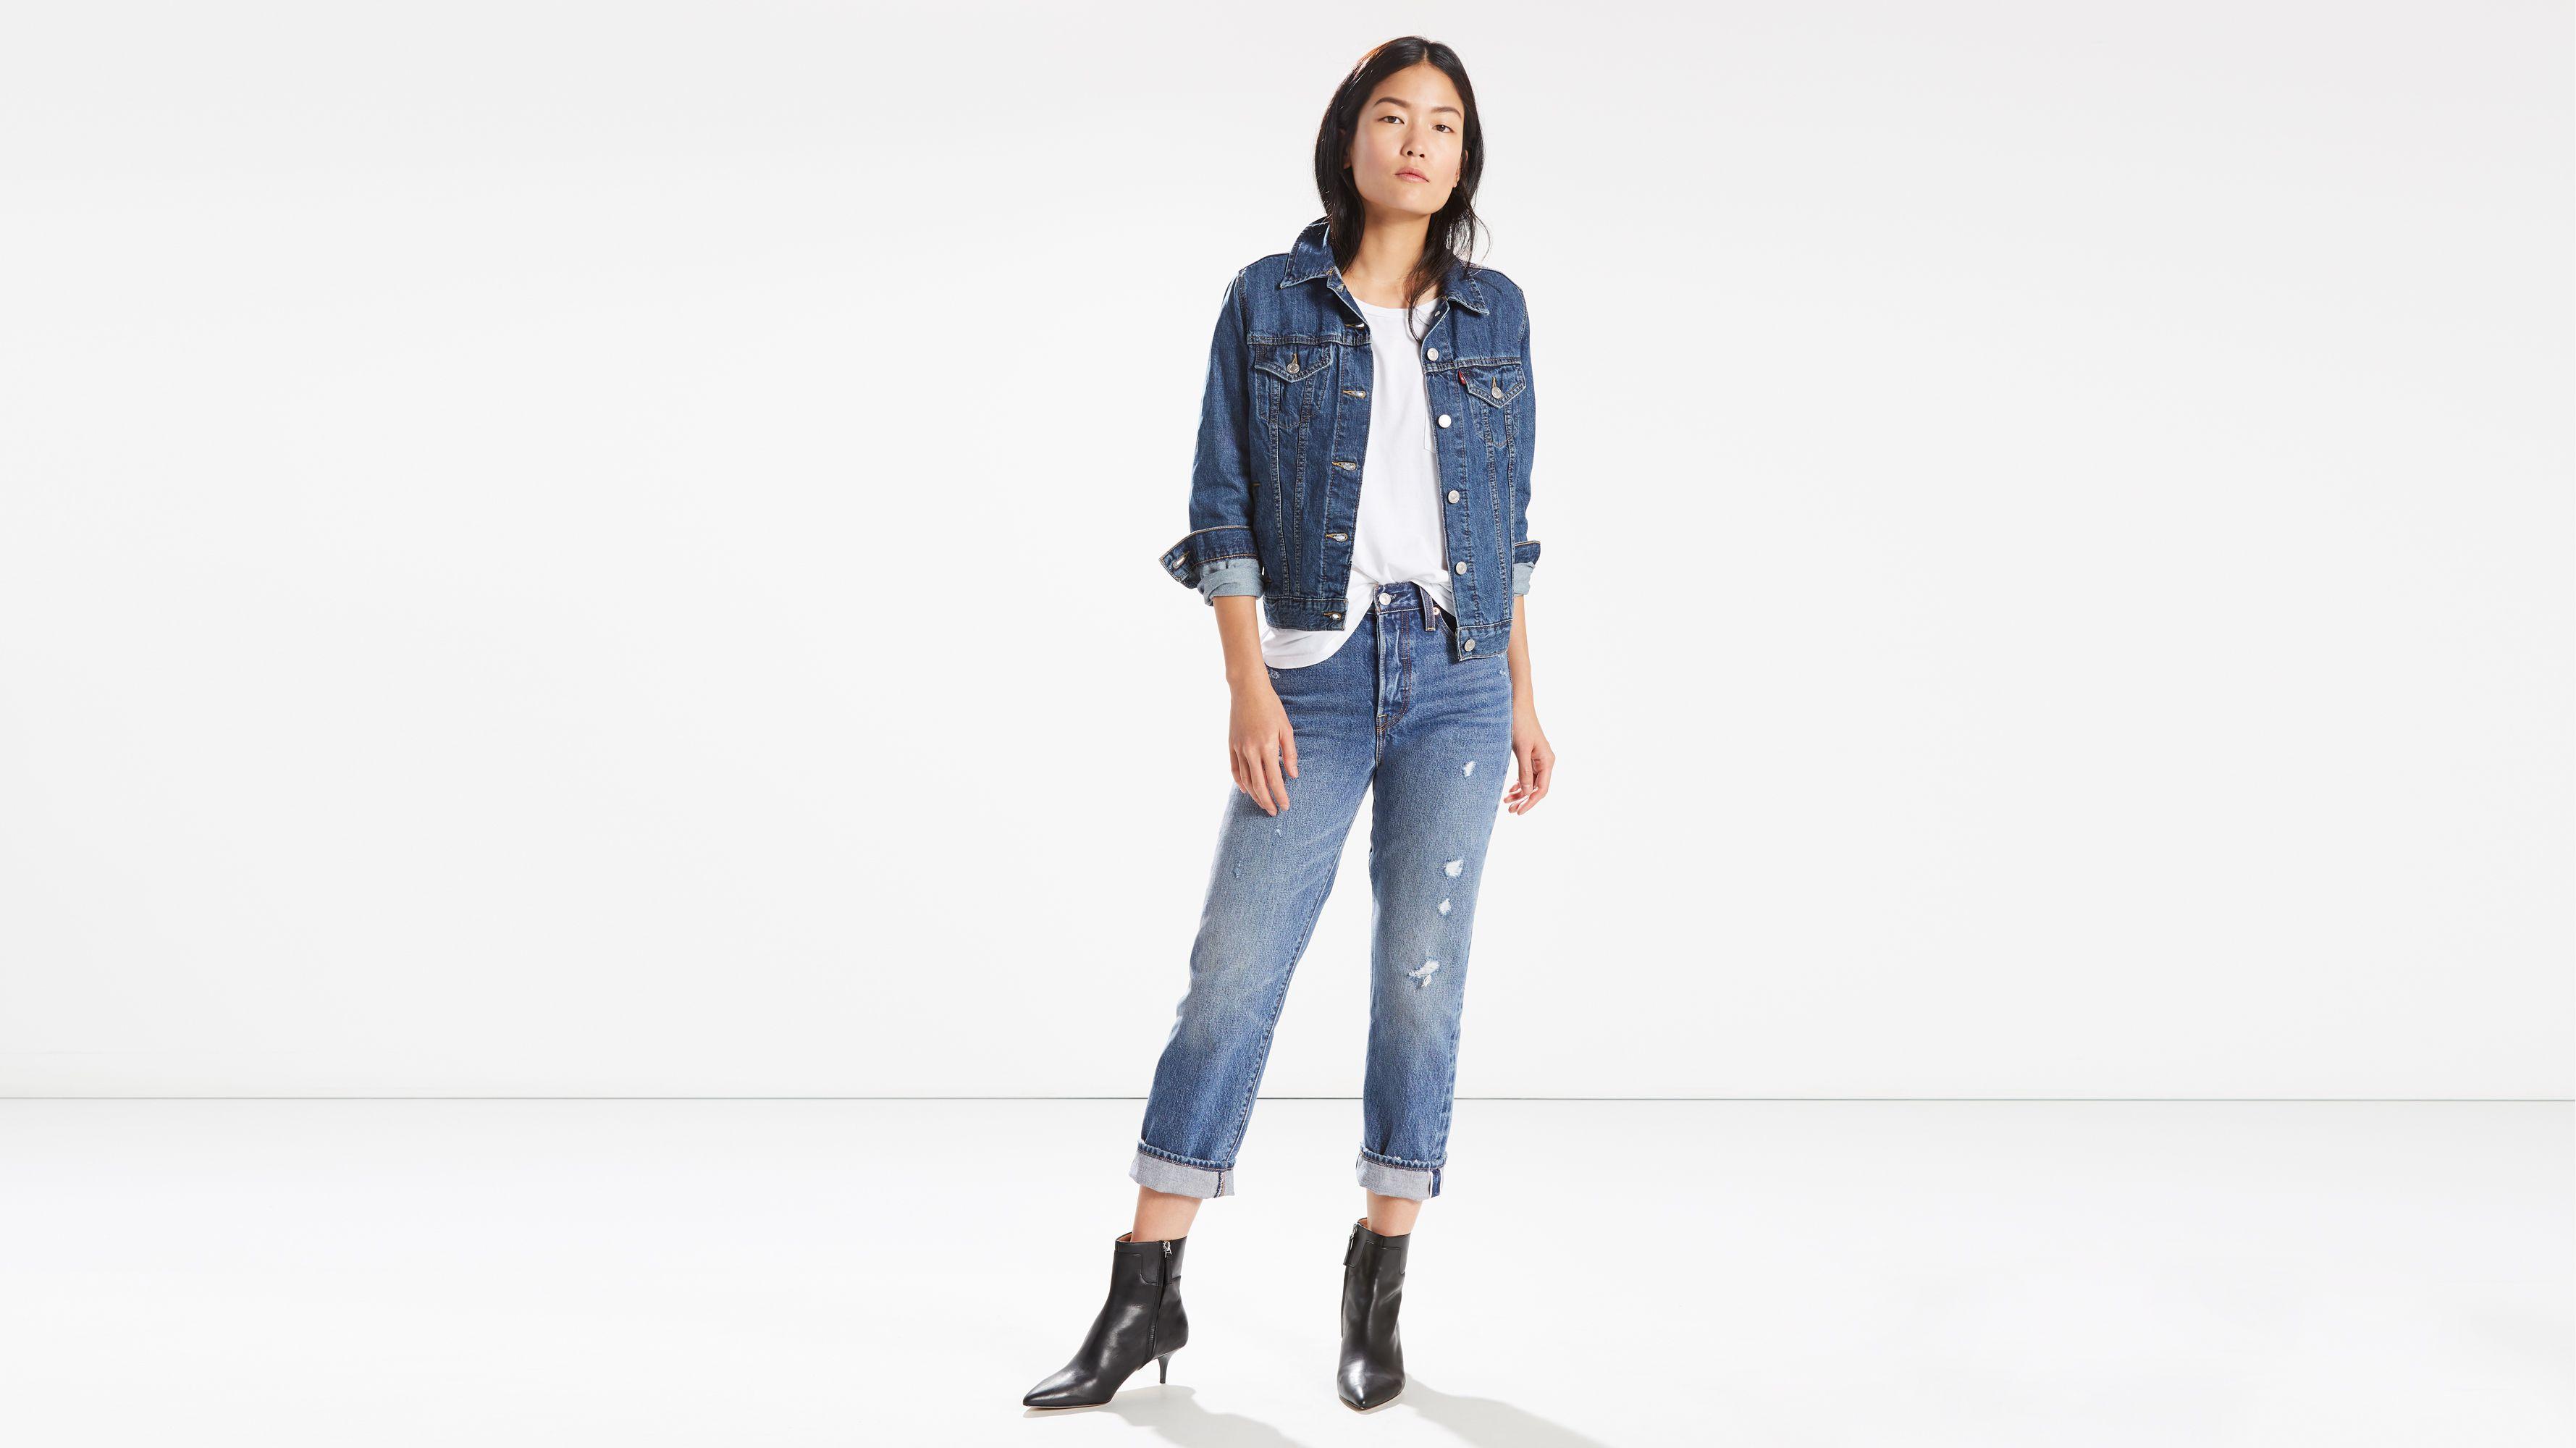 95c56c7ff6a19c Wedgie Fit Straight Jeans - Medium Wash | Levi's® US